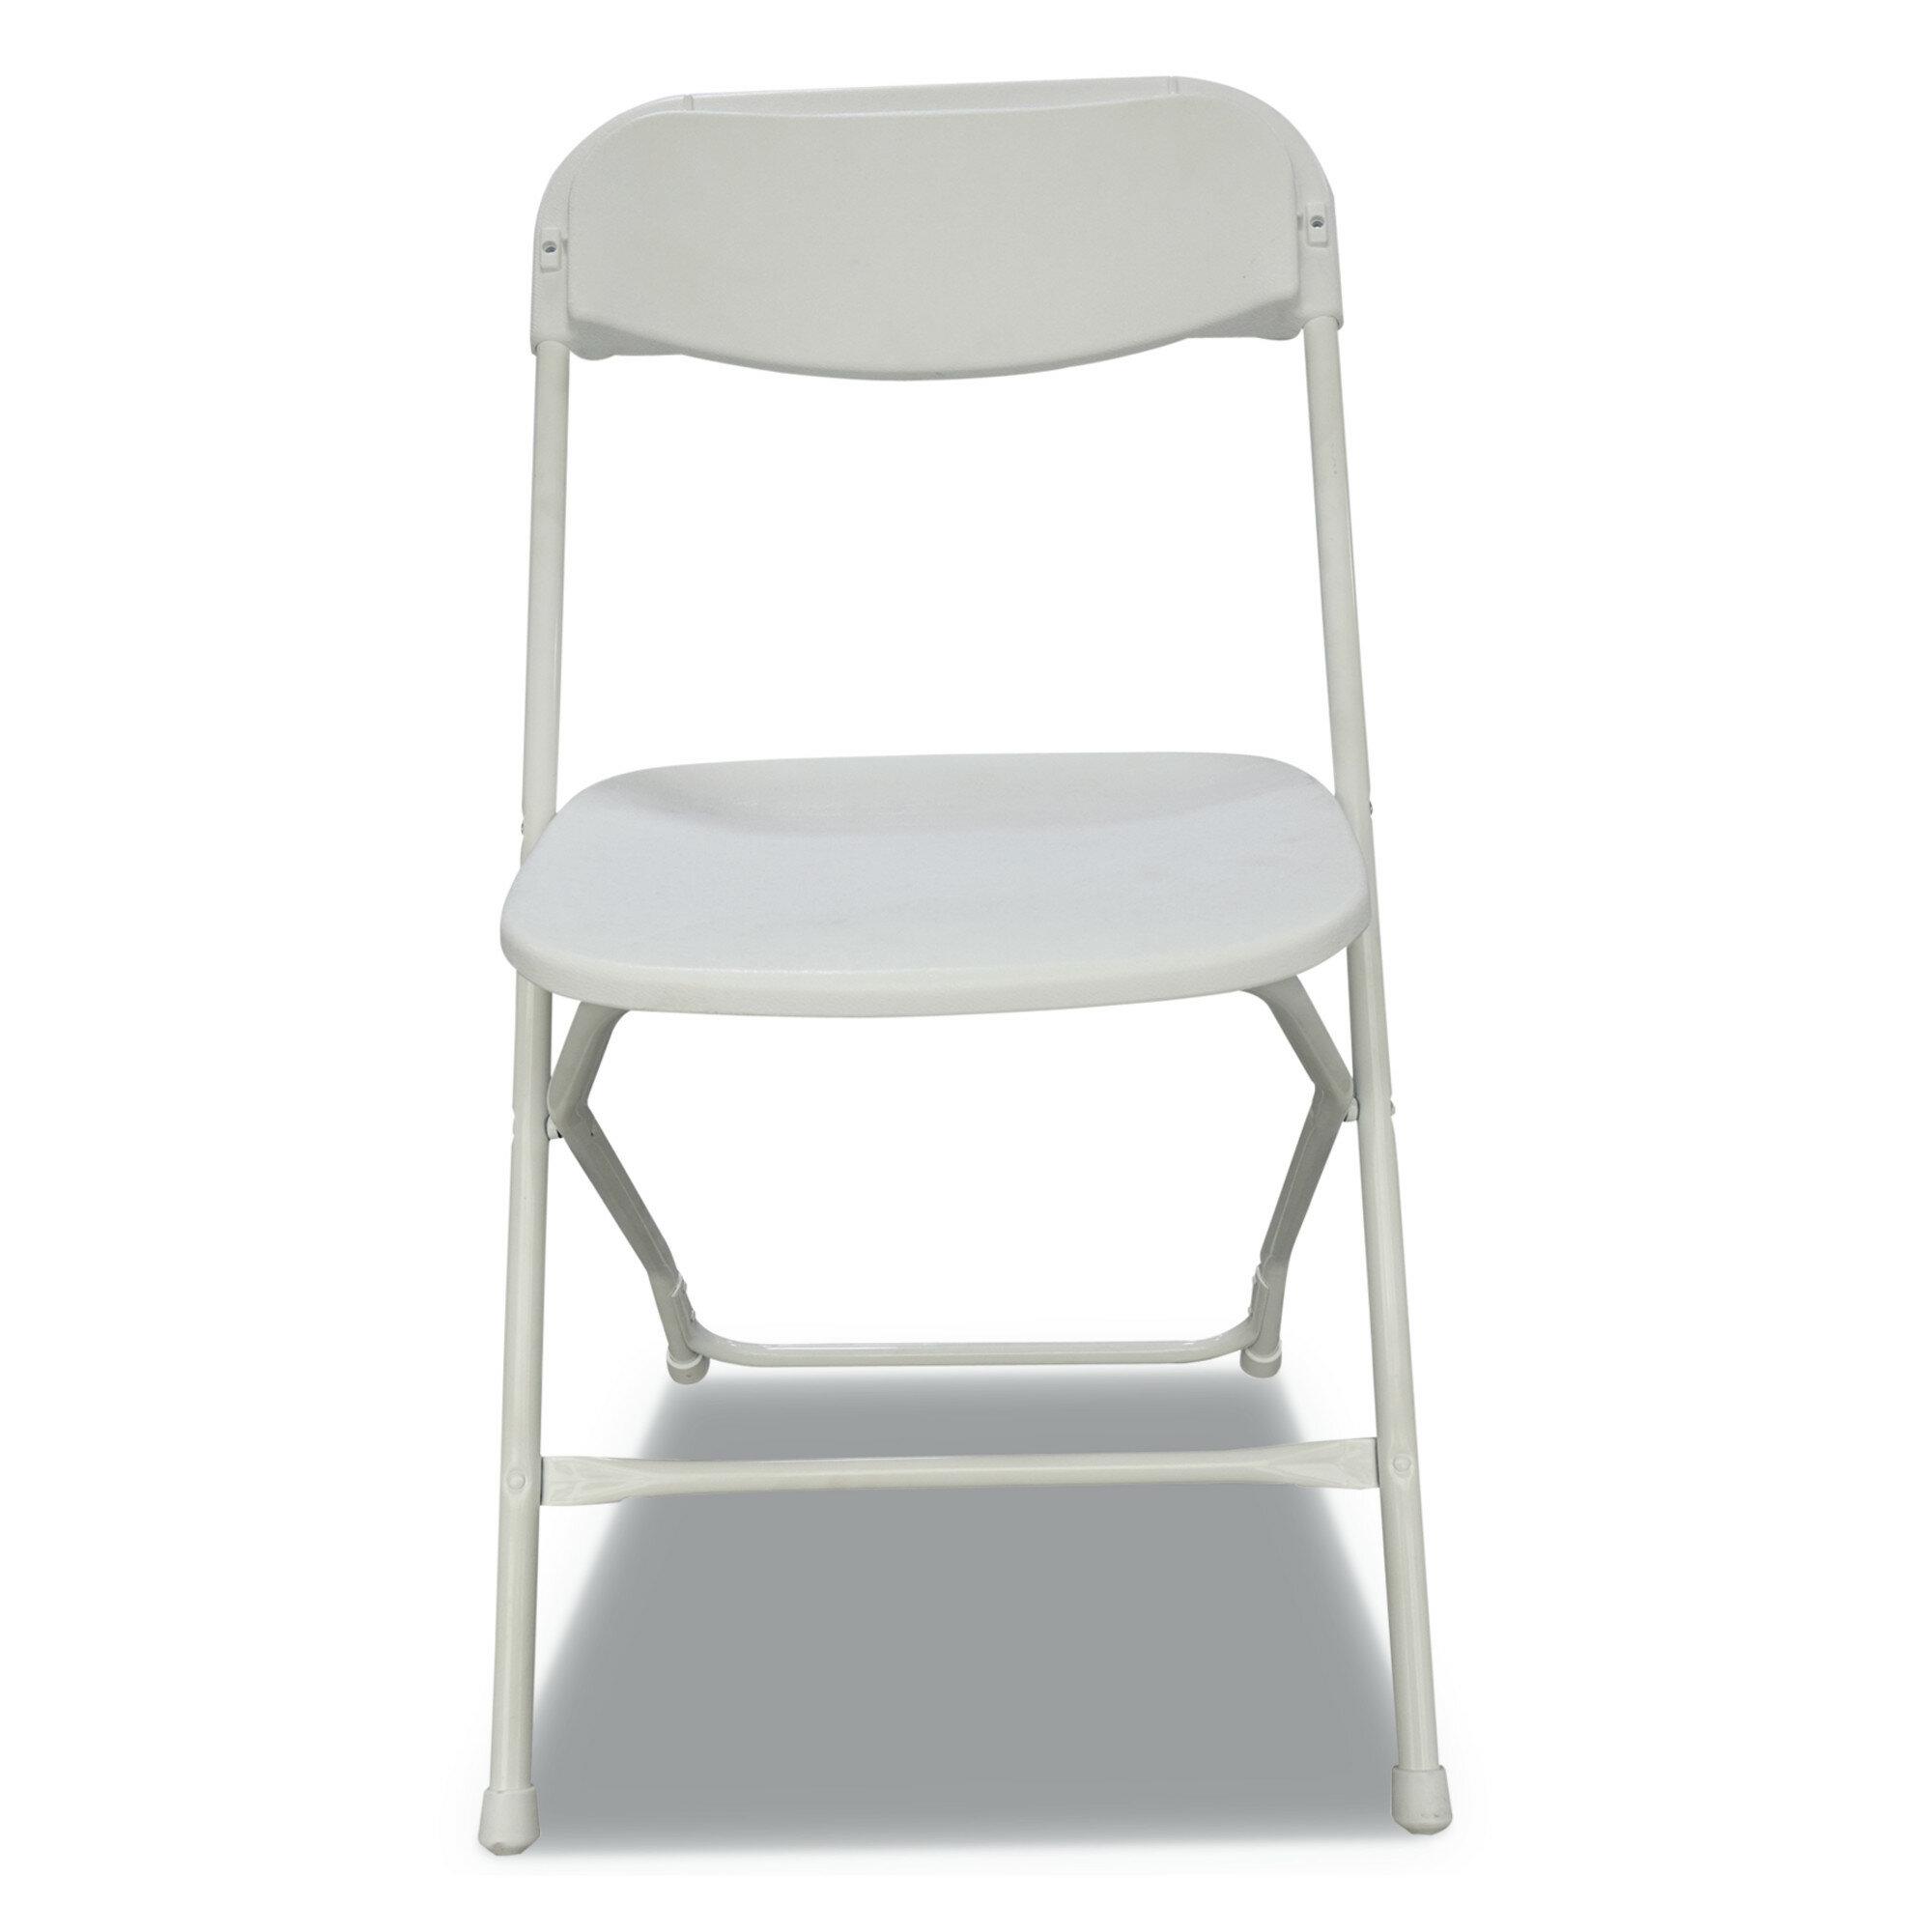 Prime Economy Resin Folding Chair Theyellowbook Wood Chair Design Ideas Theyellowbookinfo